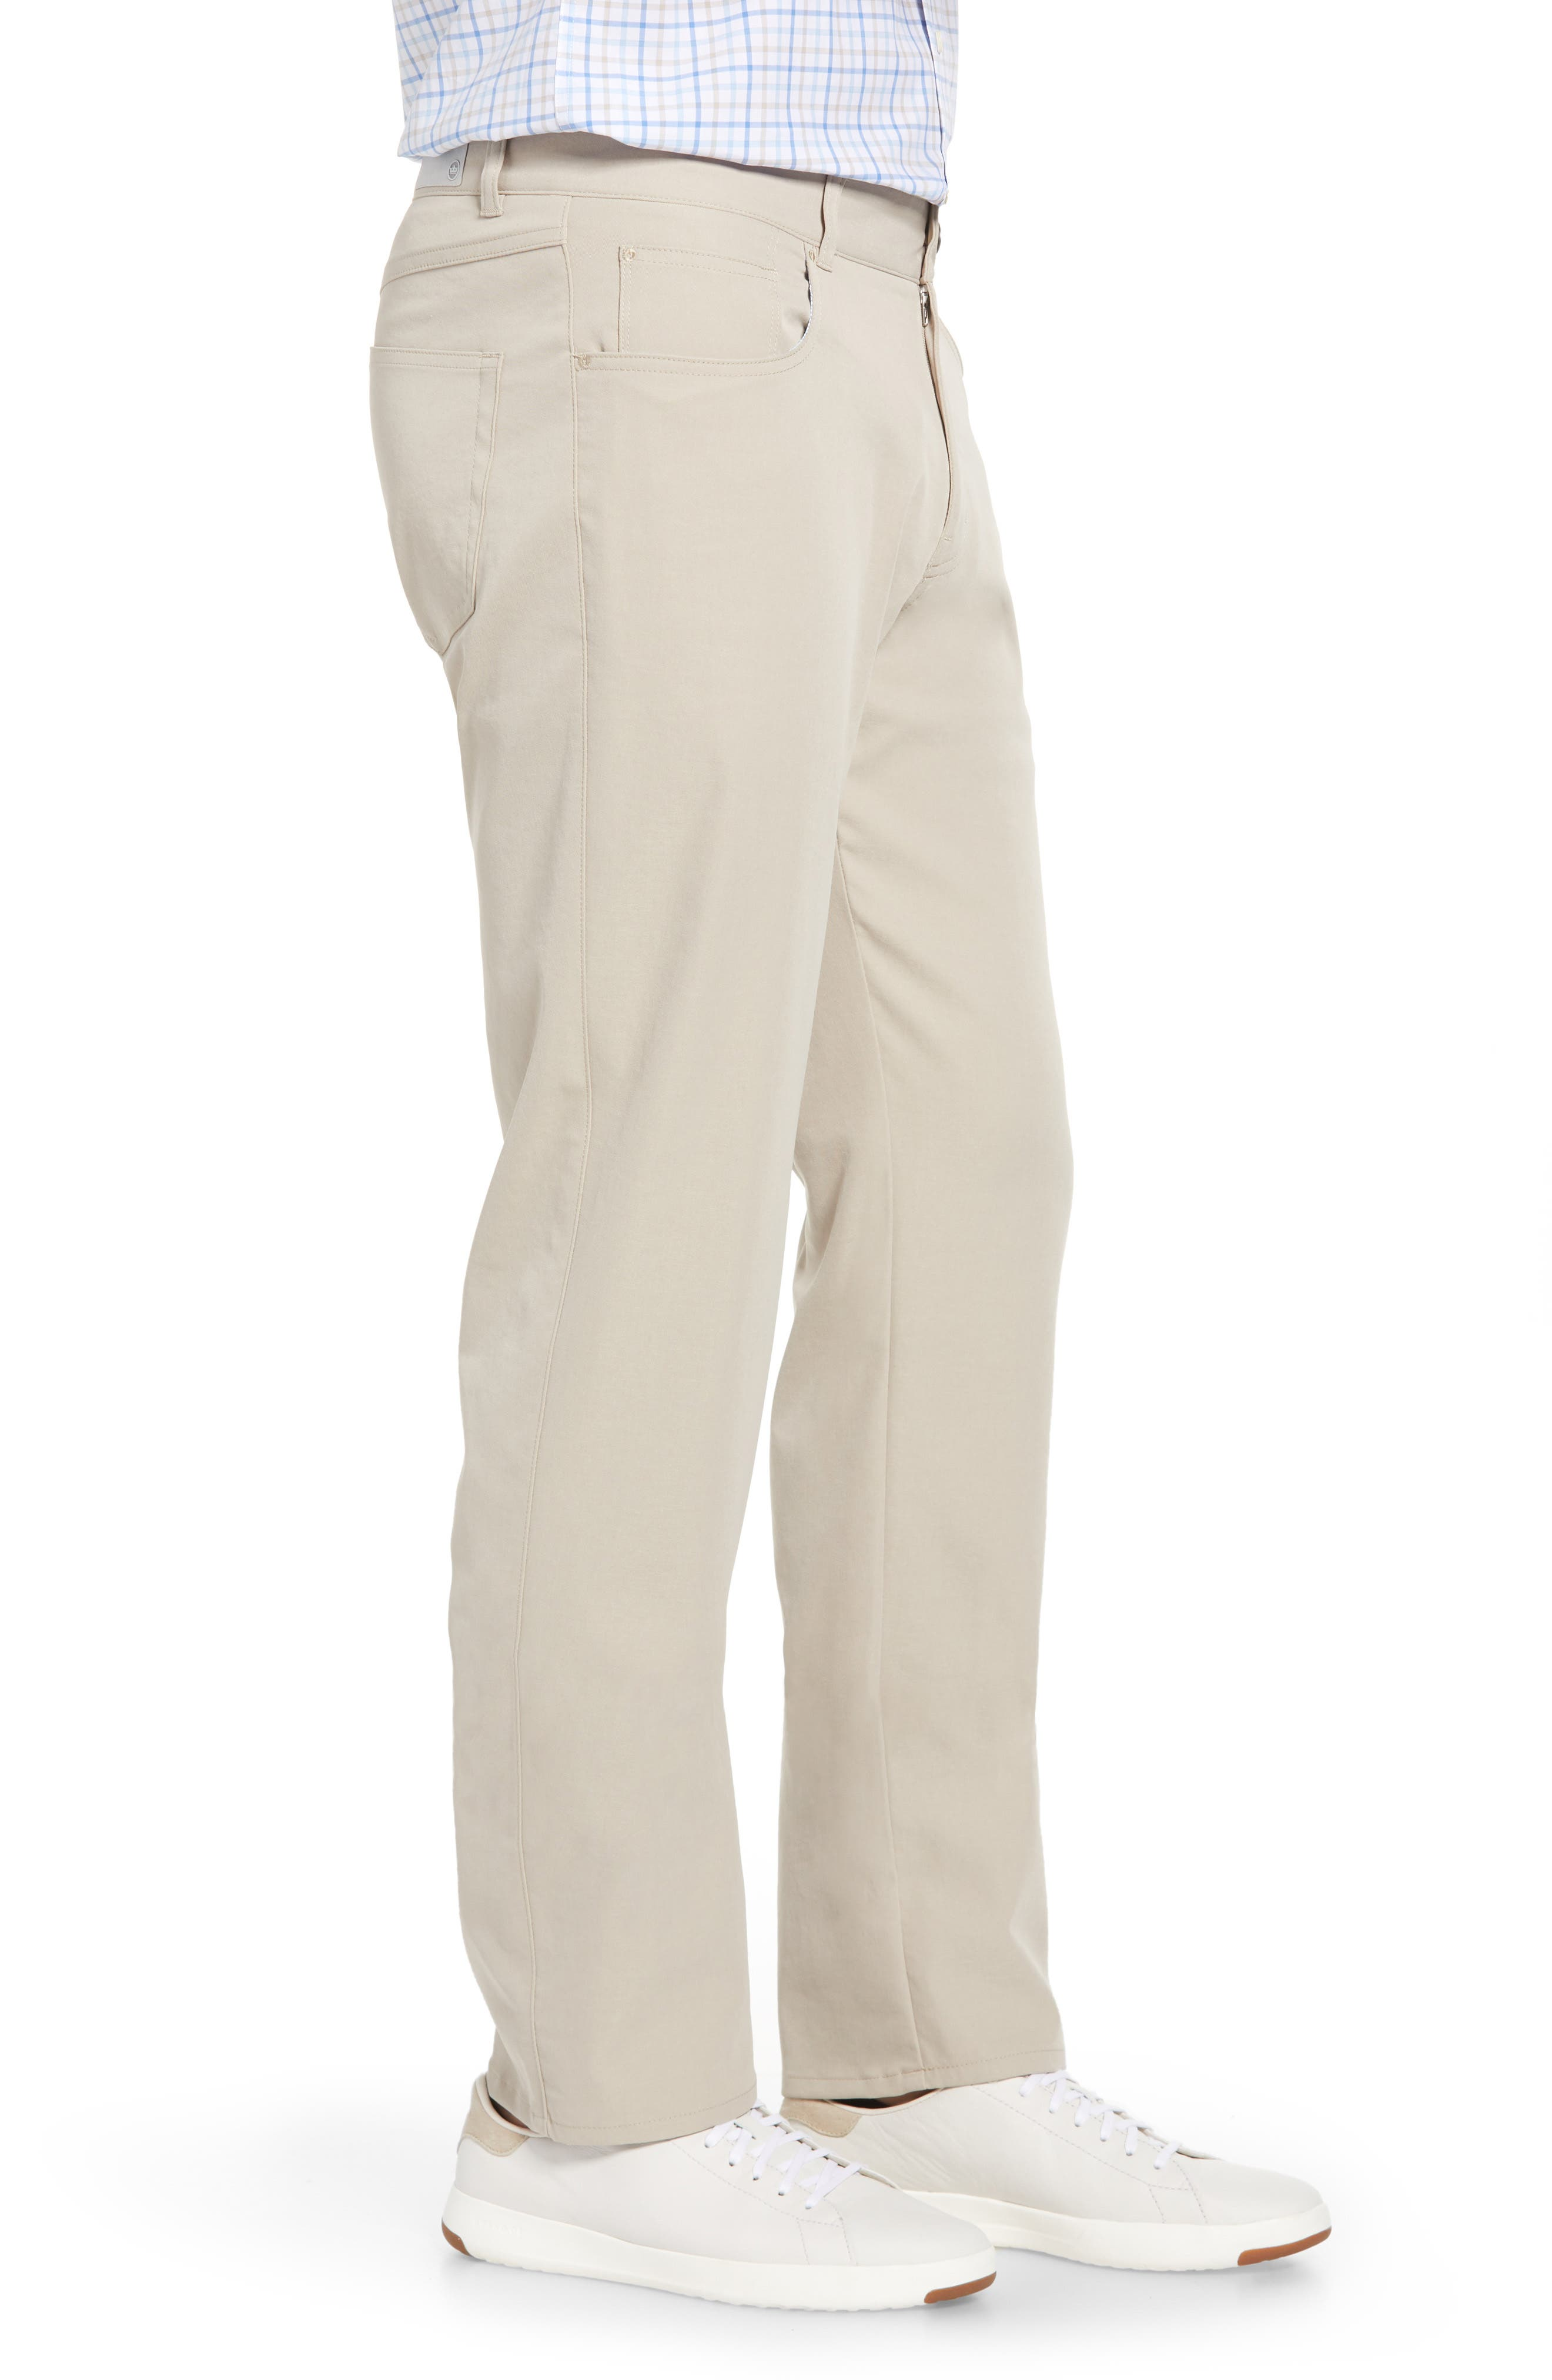 eb66 Regular Fit Performance Pants,                             Alternate thumbnail 3, color,                             BEIGE